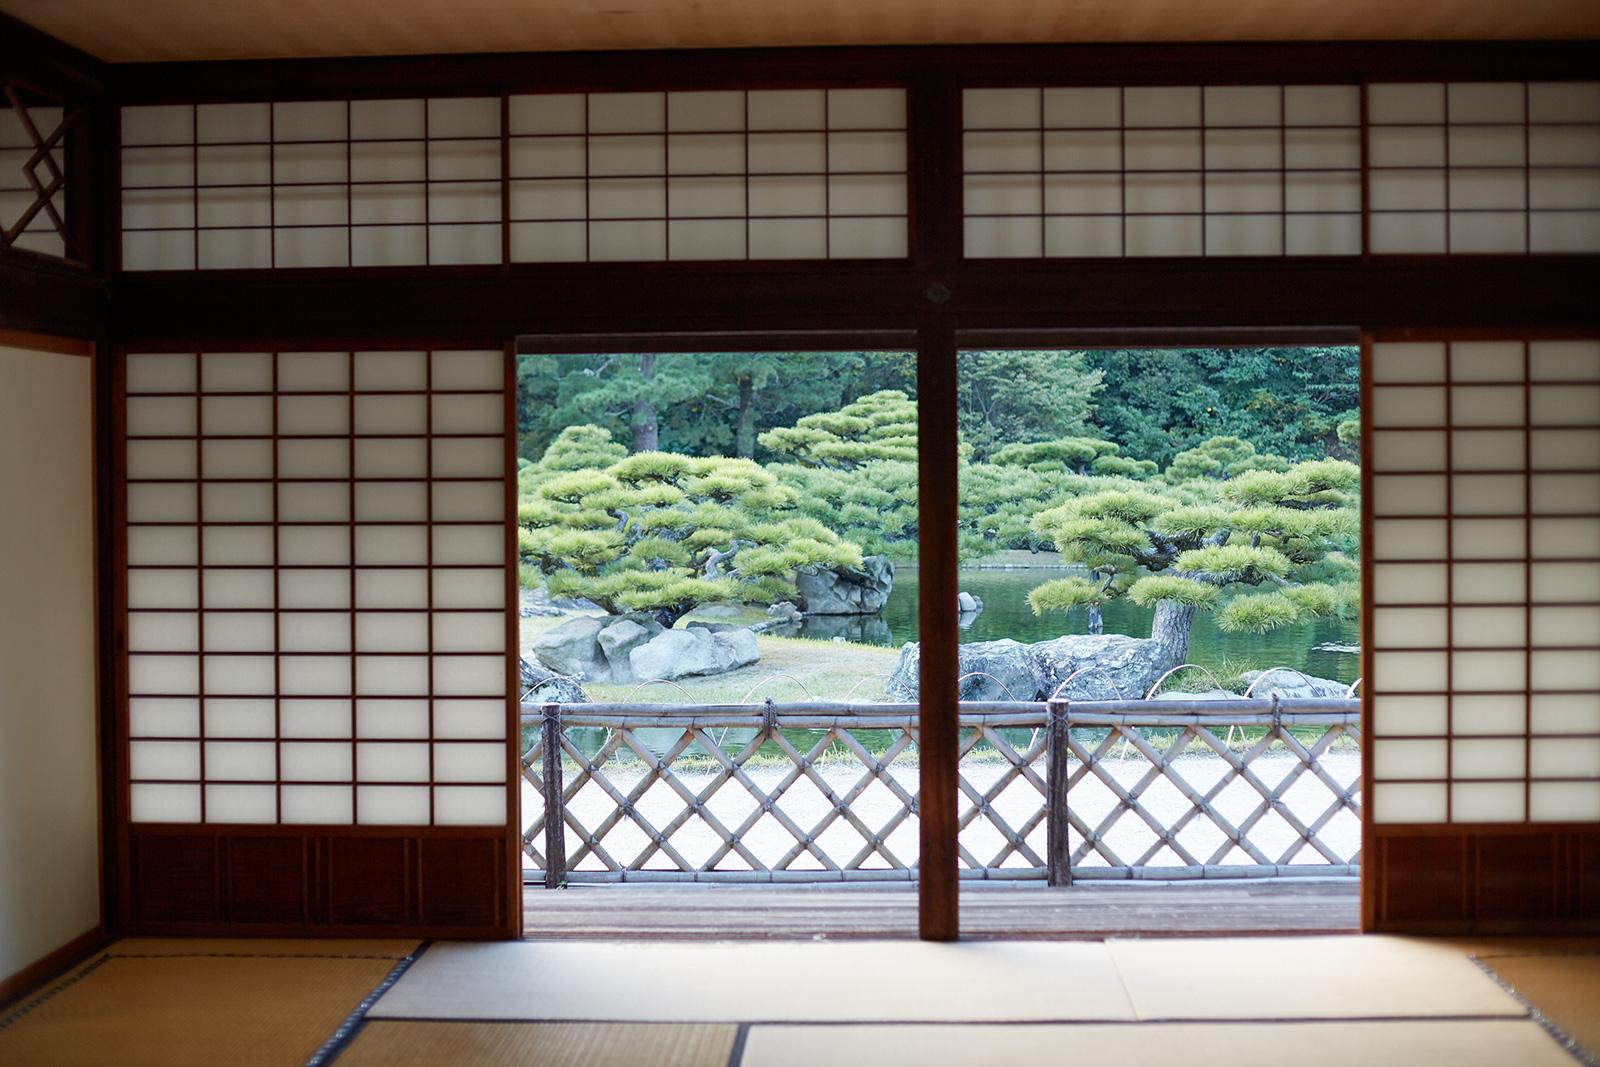 Japan's Ritsurin Garden offers a taste of timeless beauty at its Kikugetsutei teahouse